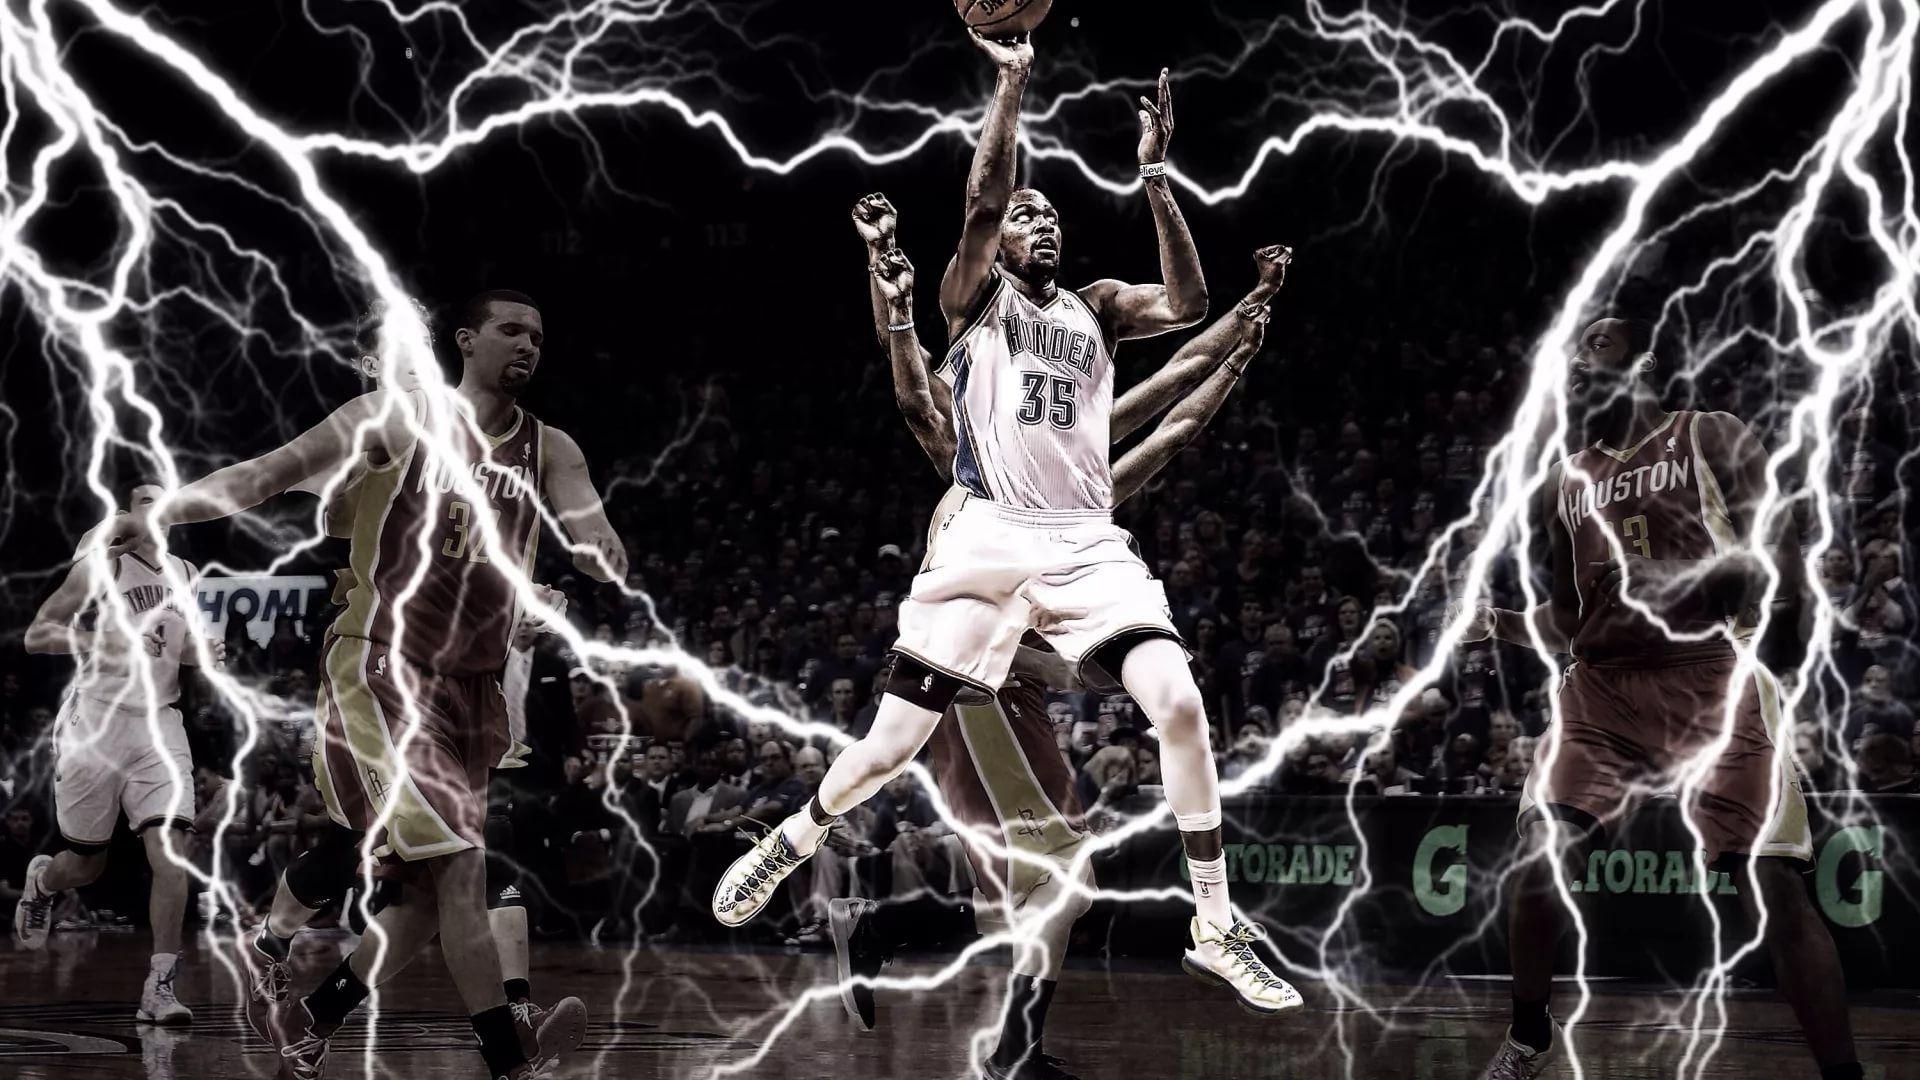 Nike Basketball Background Wallpaper HD